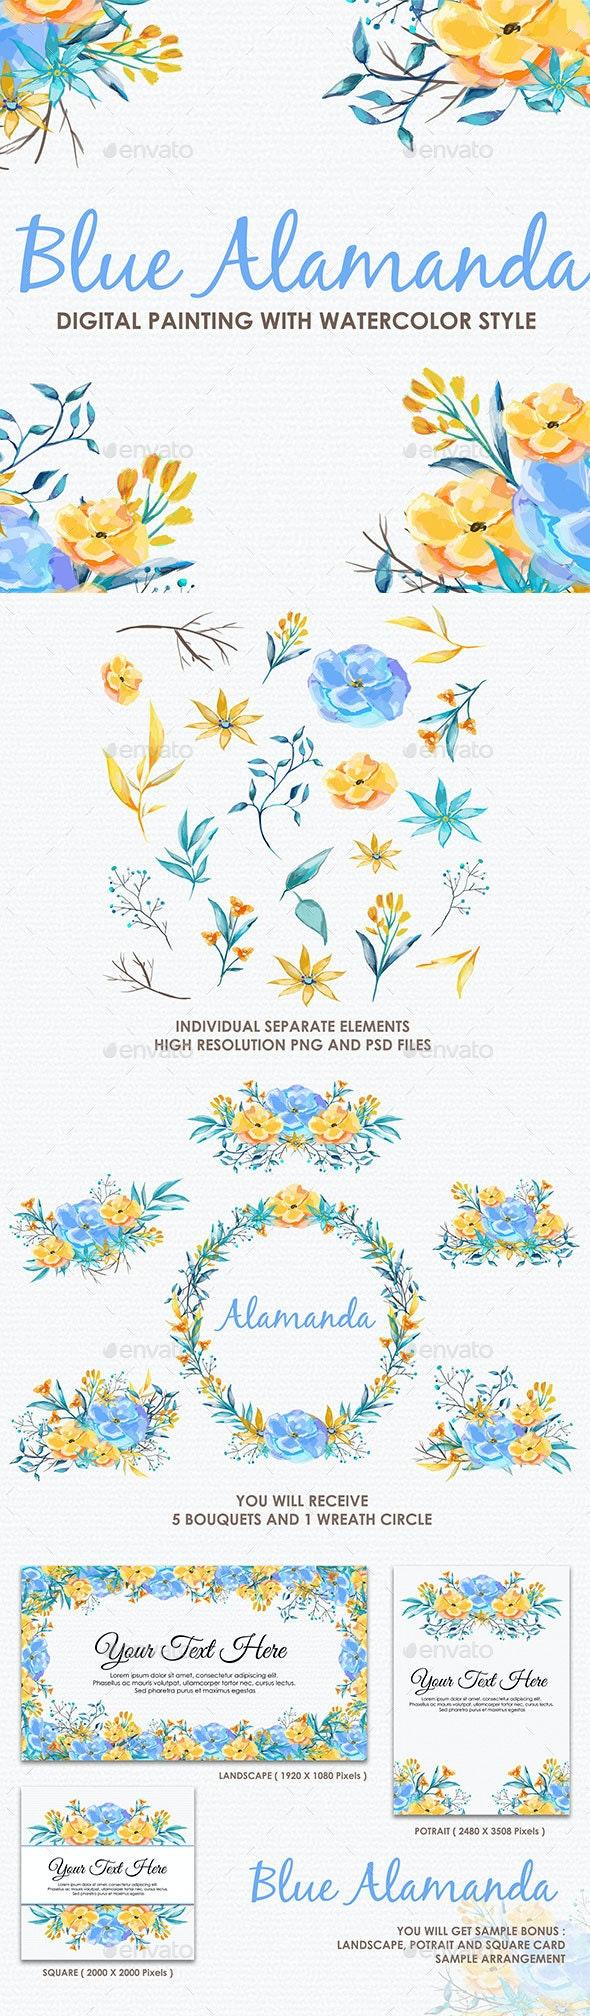 Blue Alamanda - Watercolor Digital Painting Floral Flowers Style - Flourishes / Swirls Decorative